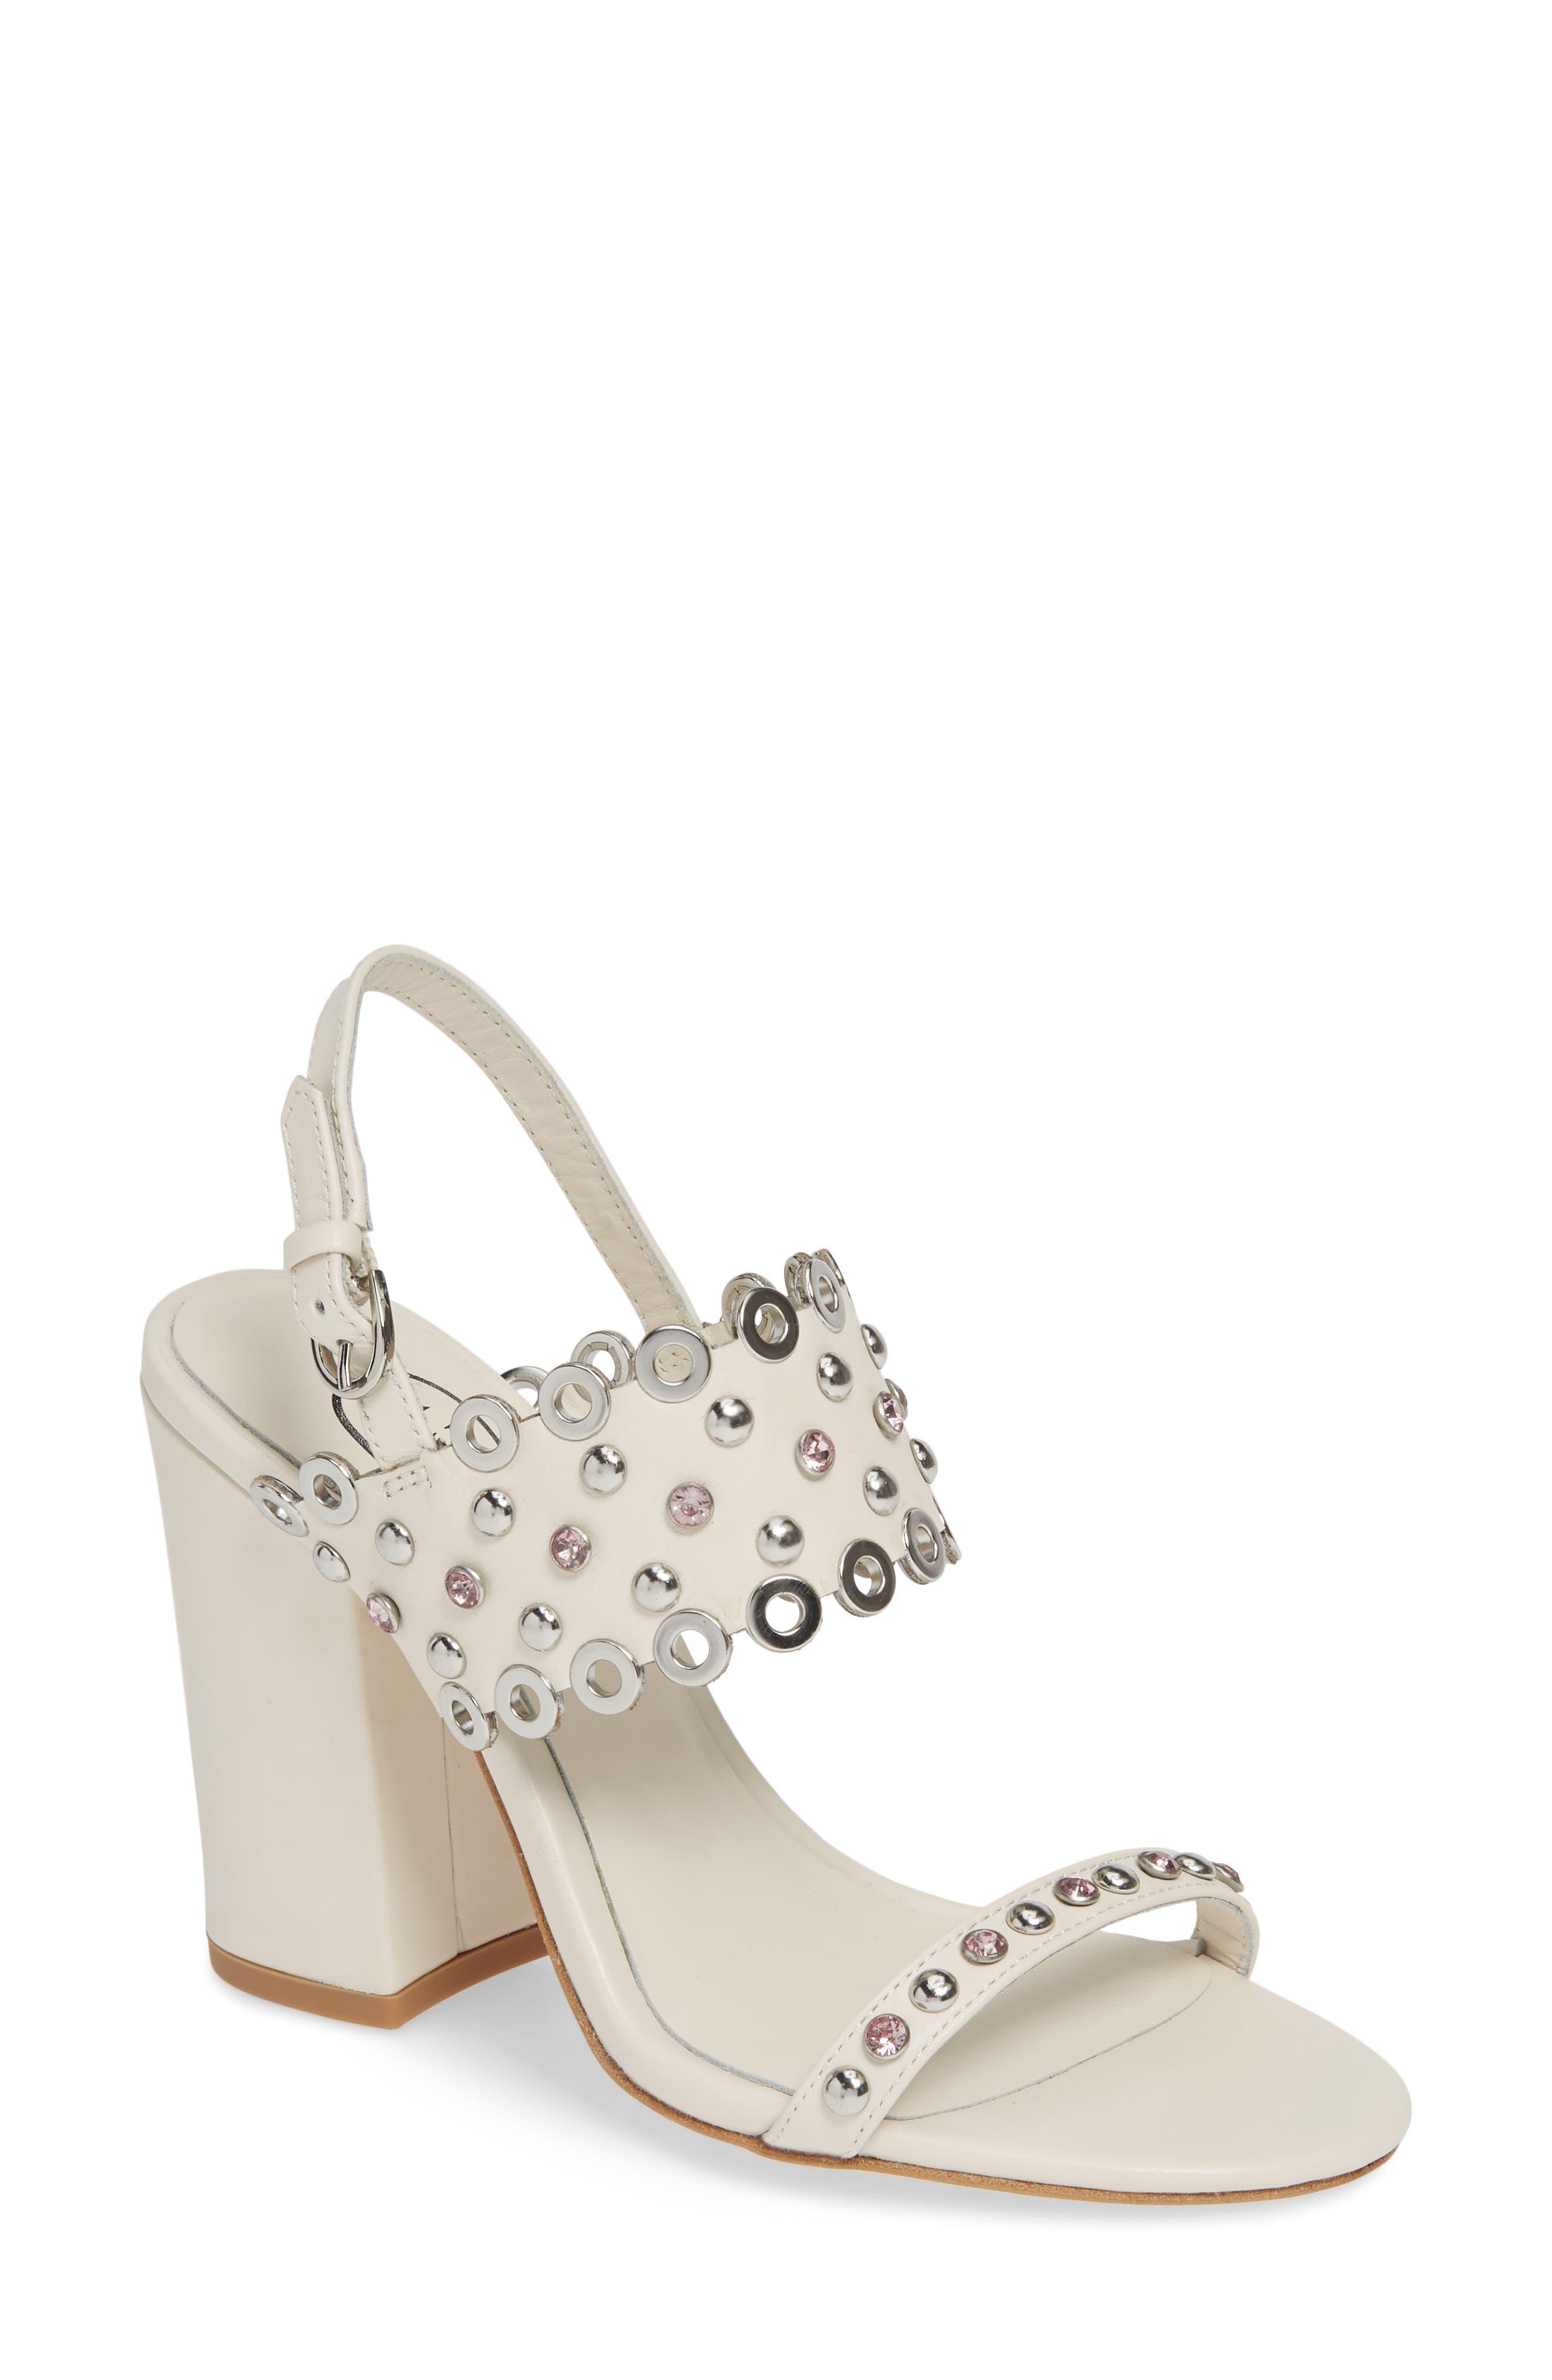 Ash Lucy Studded Quarter Strap Sandal, White